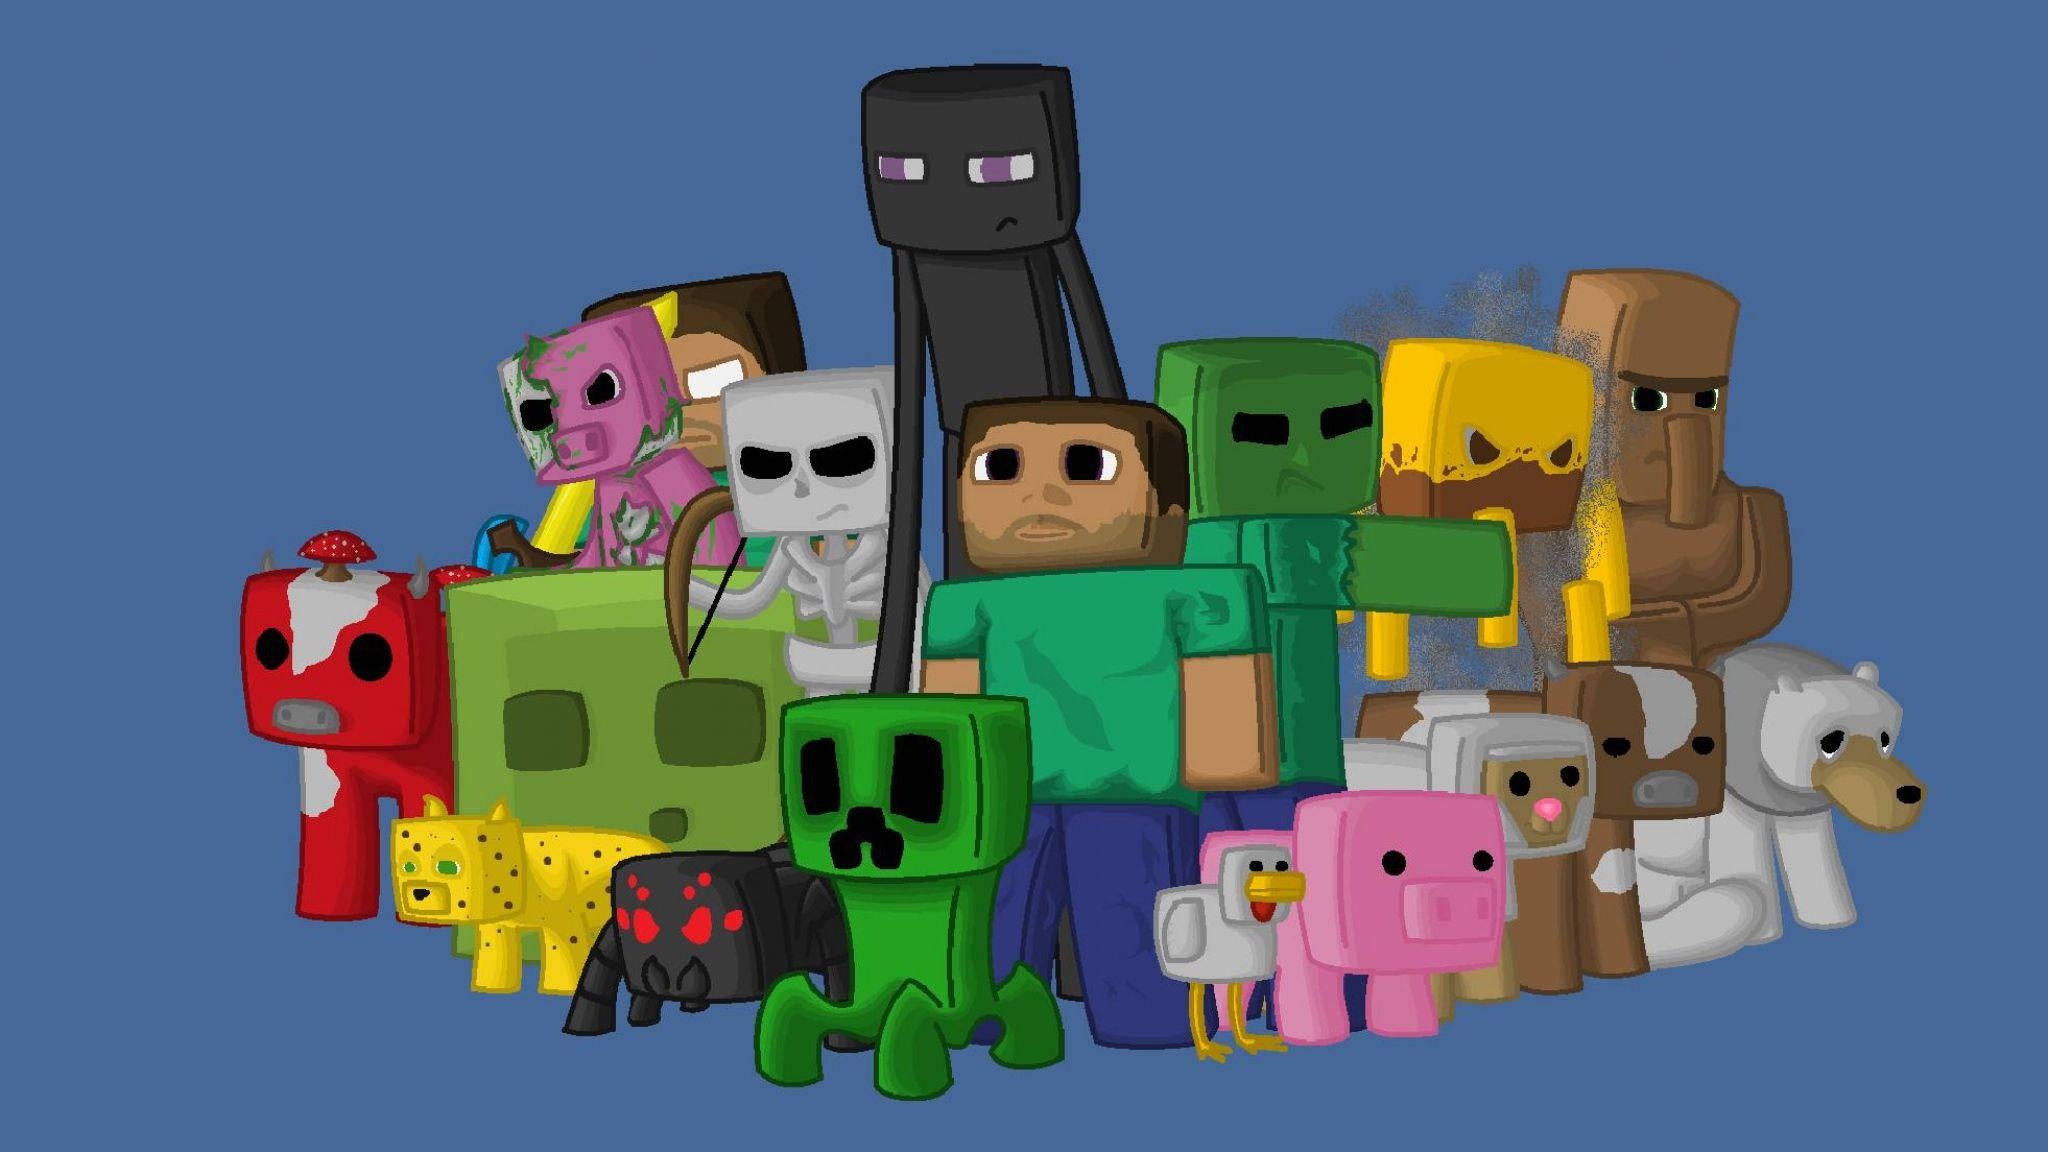 2048x1152 Wallpaper Minecraft Characters Game Pixels Java Josue